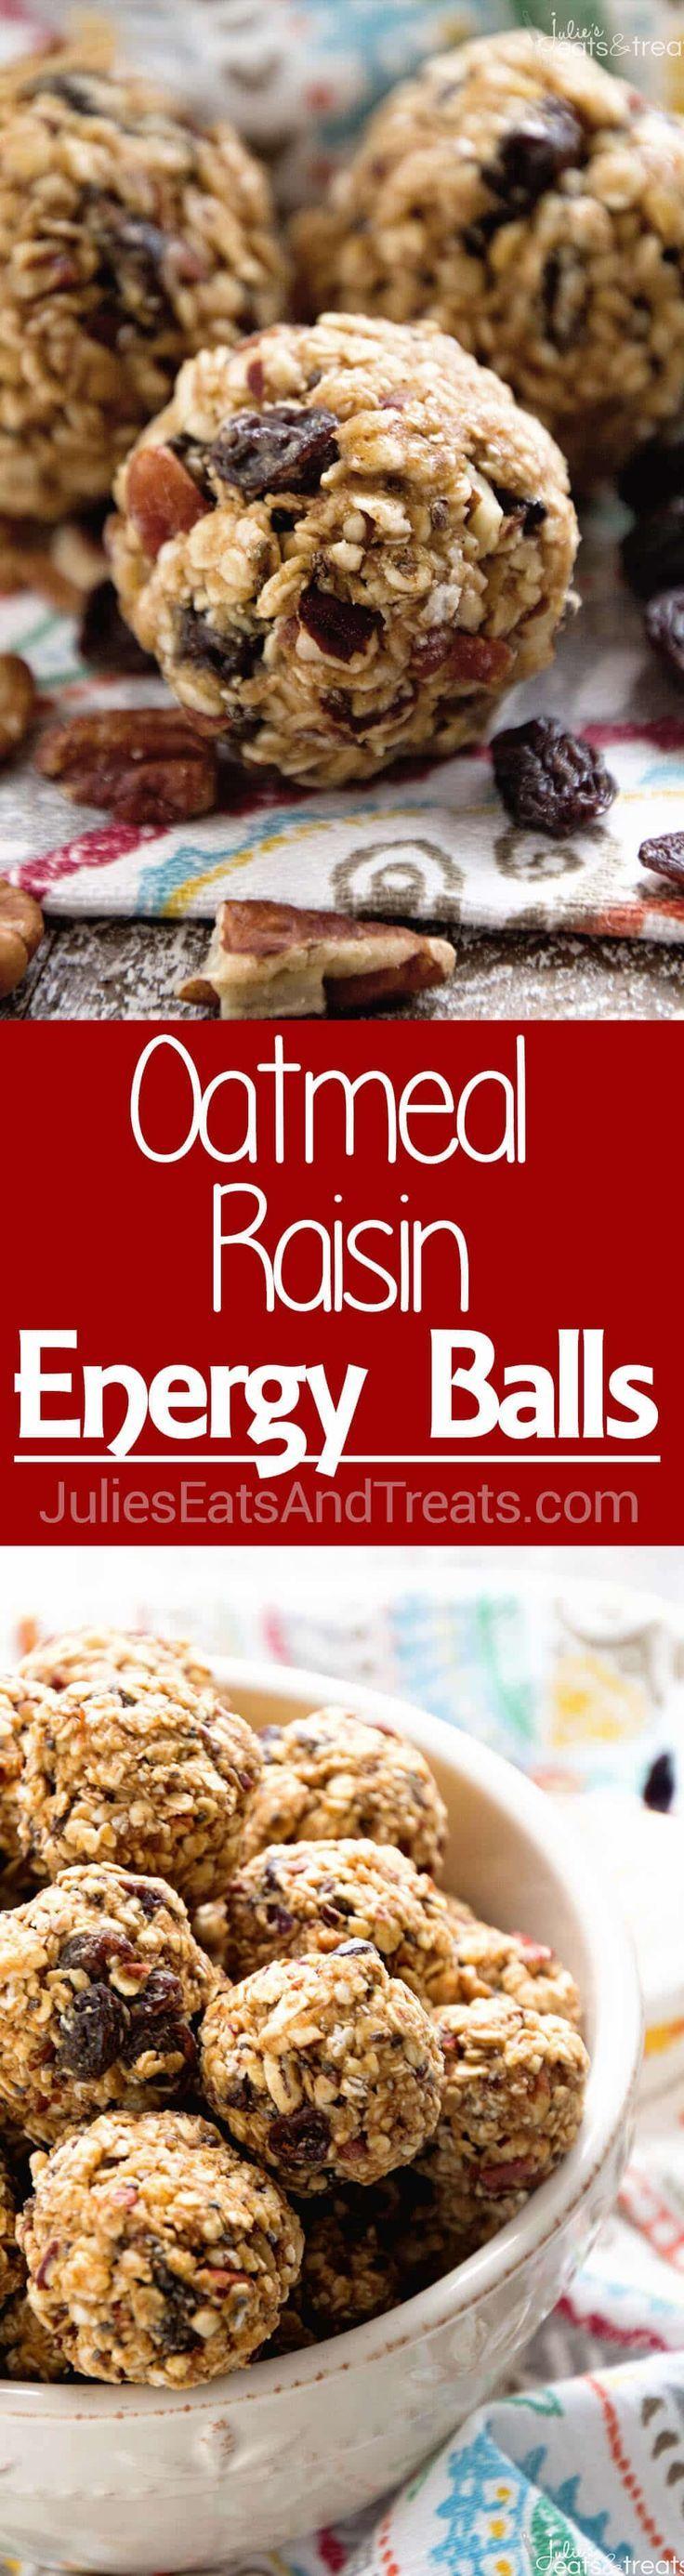 No Bake Oatmeal Raisin Energy Balls Recipe ~ Delicious Energy Balls That Taste Just like Oatmeal Raisin Cookies! Loaded with Oatmeal, Raisins, Pecans, Flaxseed, Chia Seeds and Spiced with Cinnamon! ~ https://www.julieseatsandtreats.com